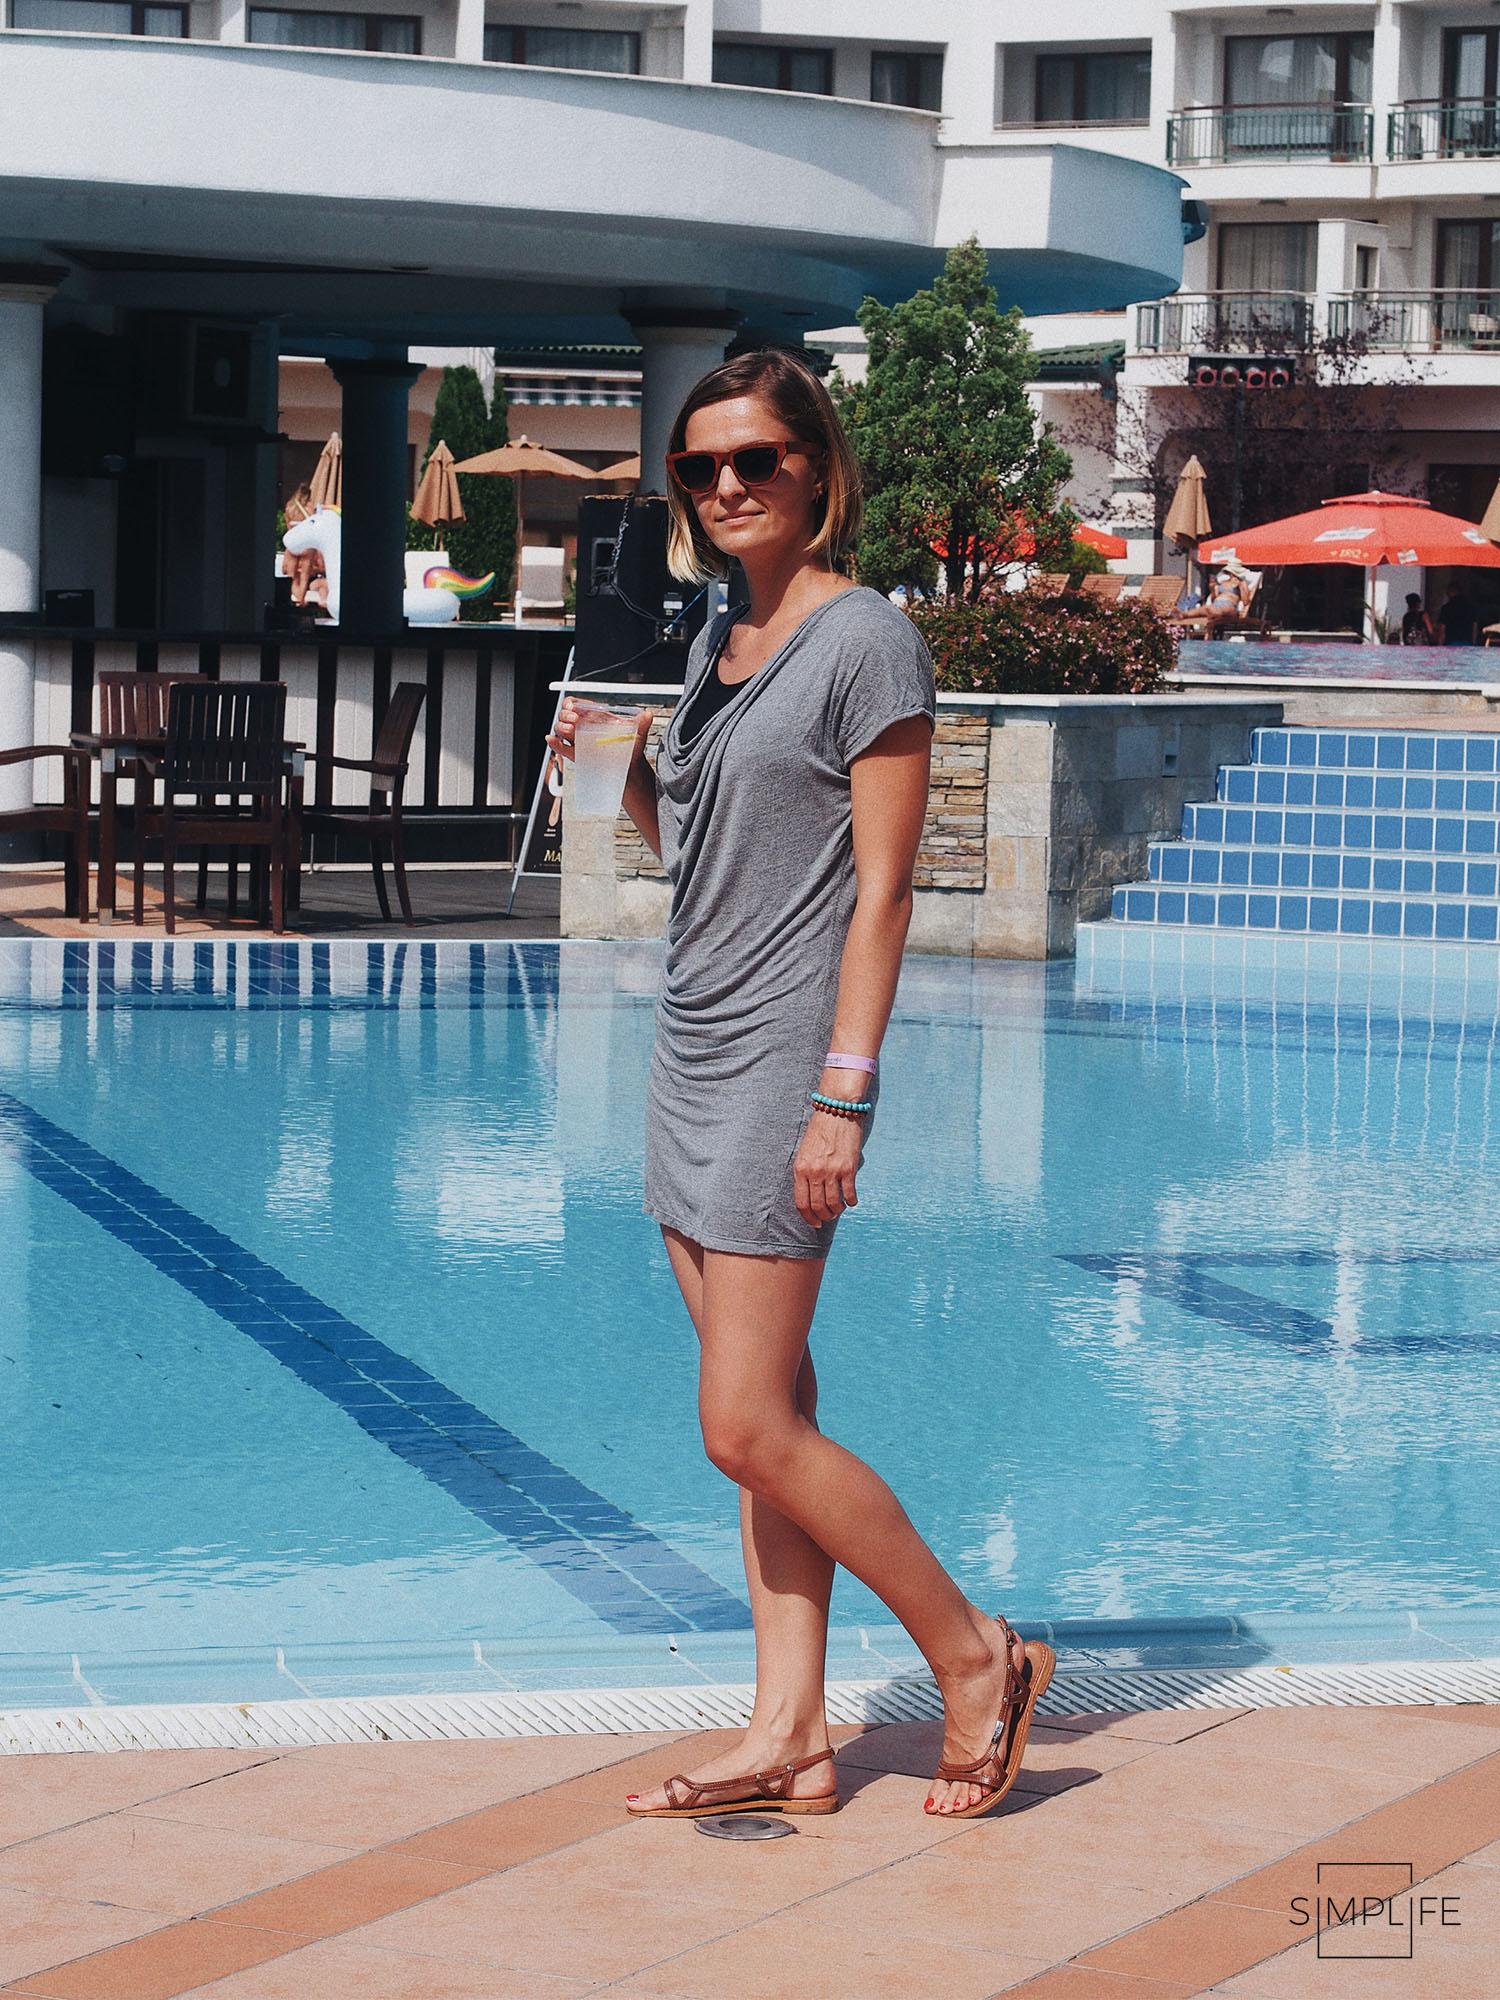 hotel Bułgaria we wrześniu